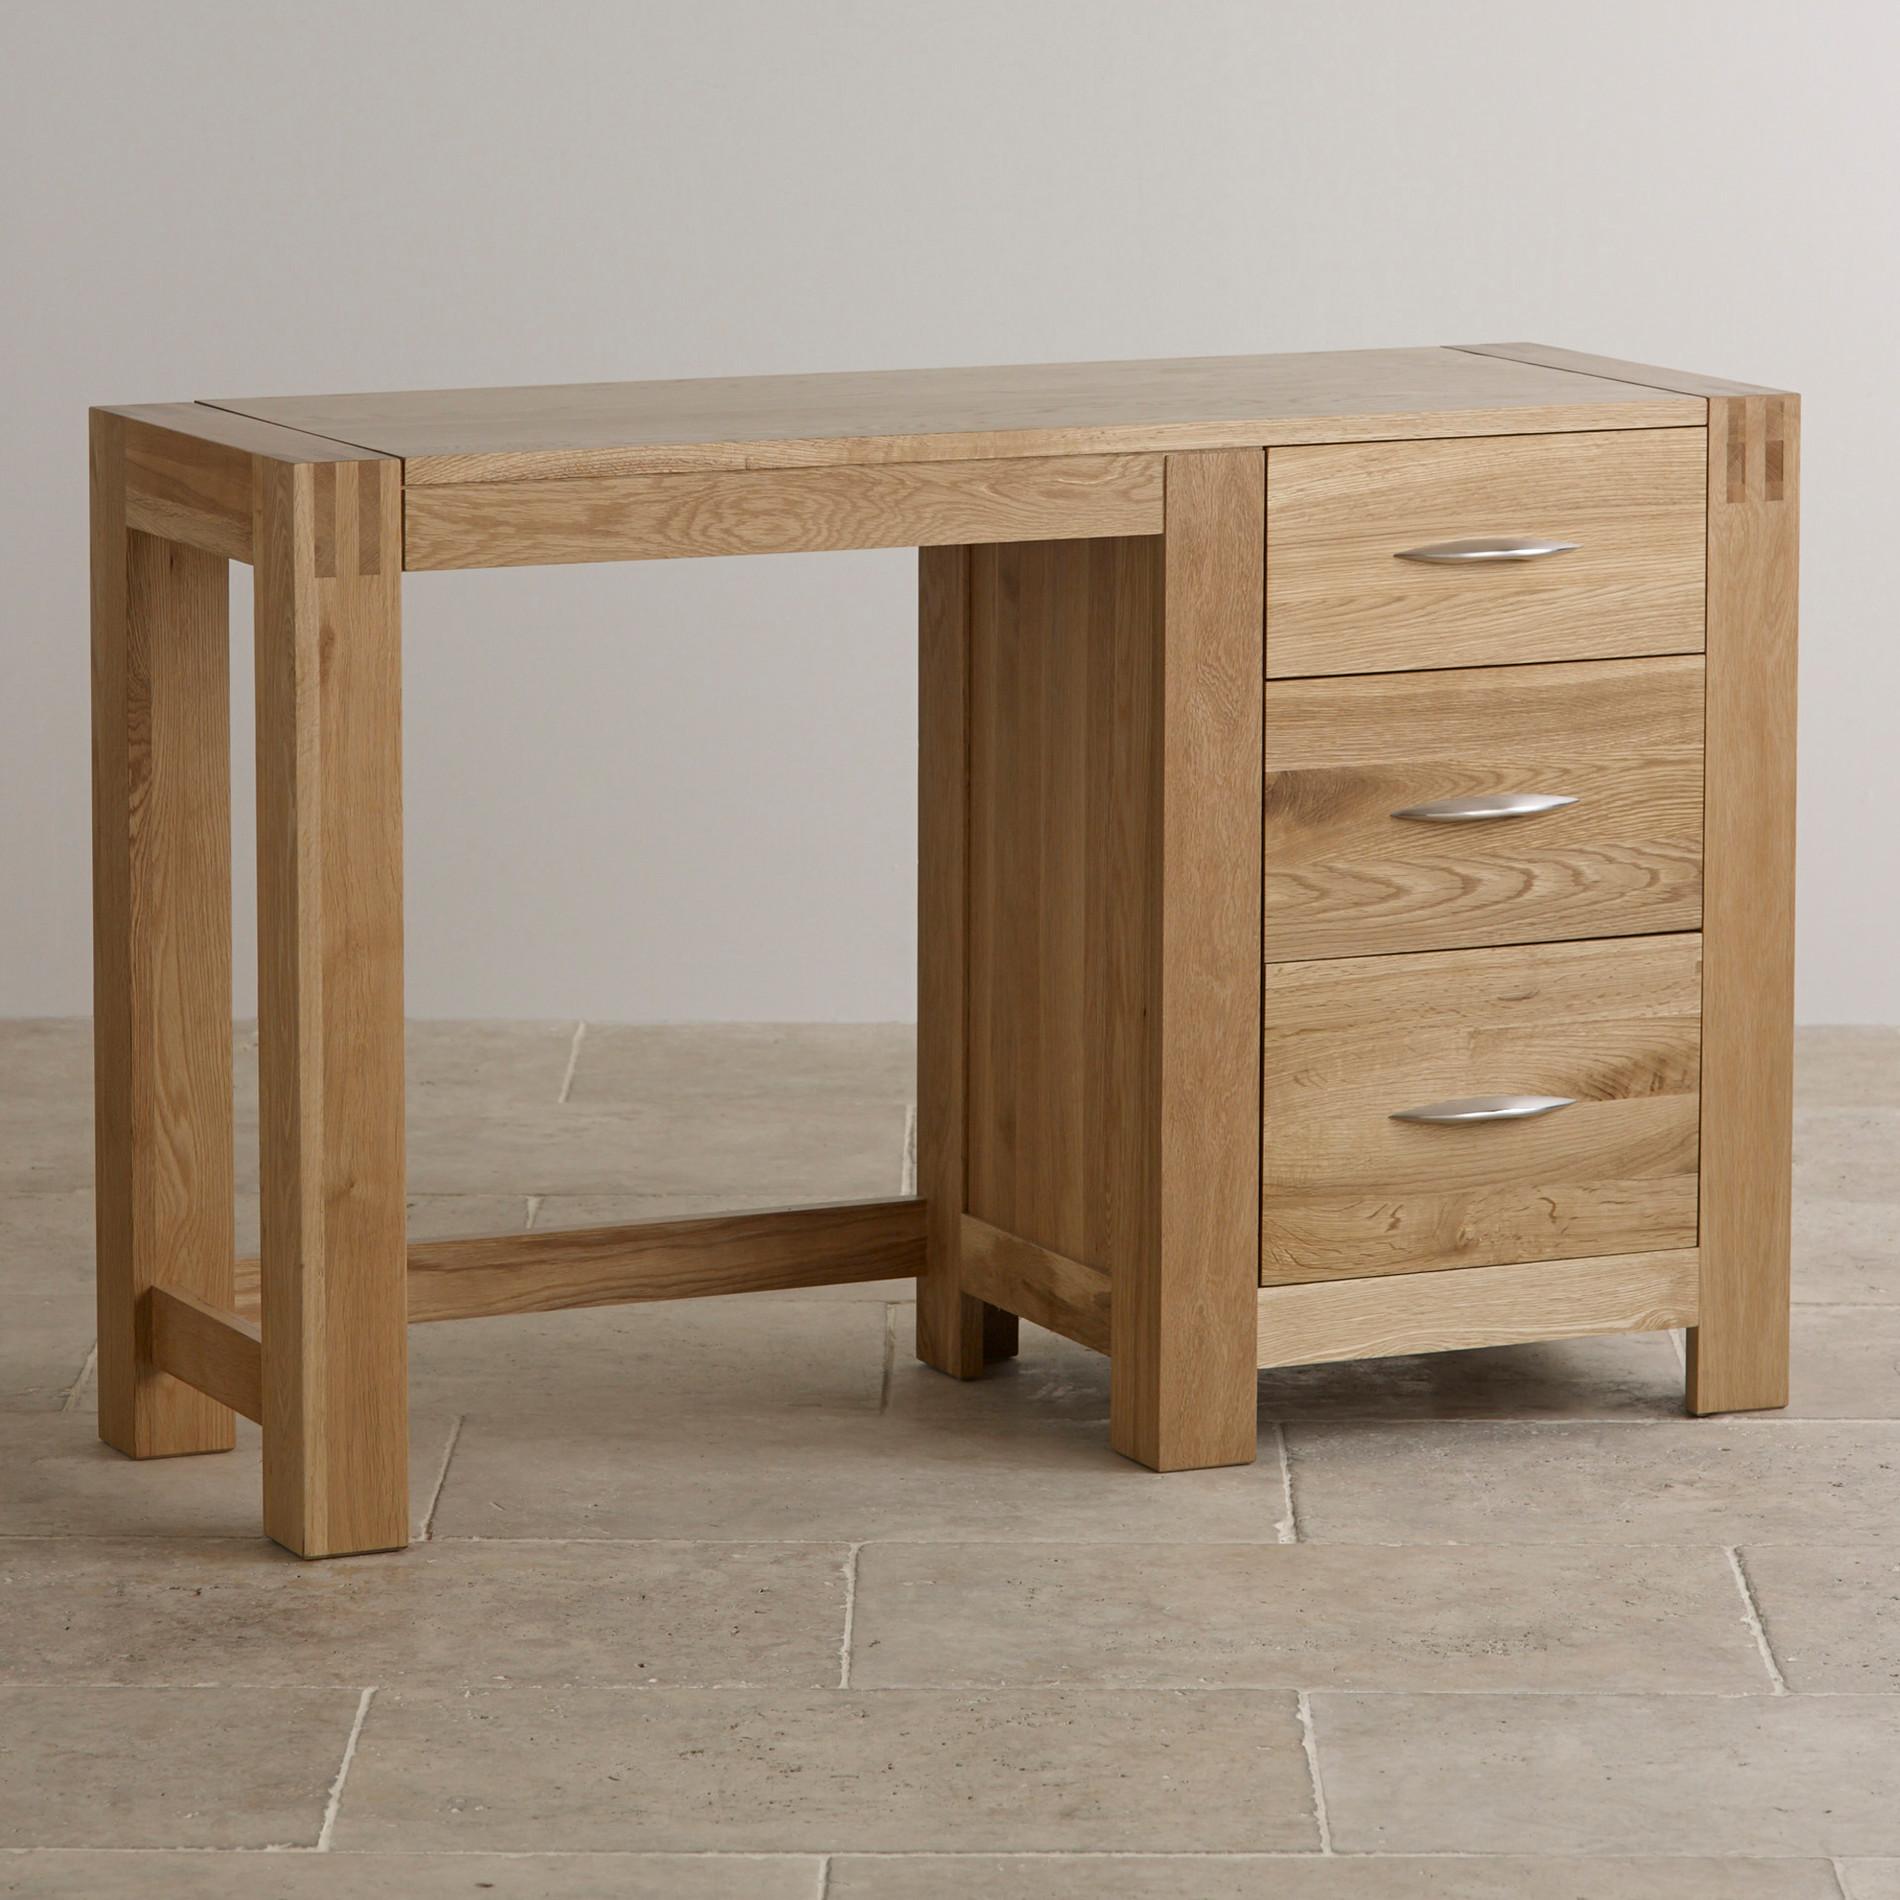 oak furniture land living room sets japanese style alto dressing table in natural solid |